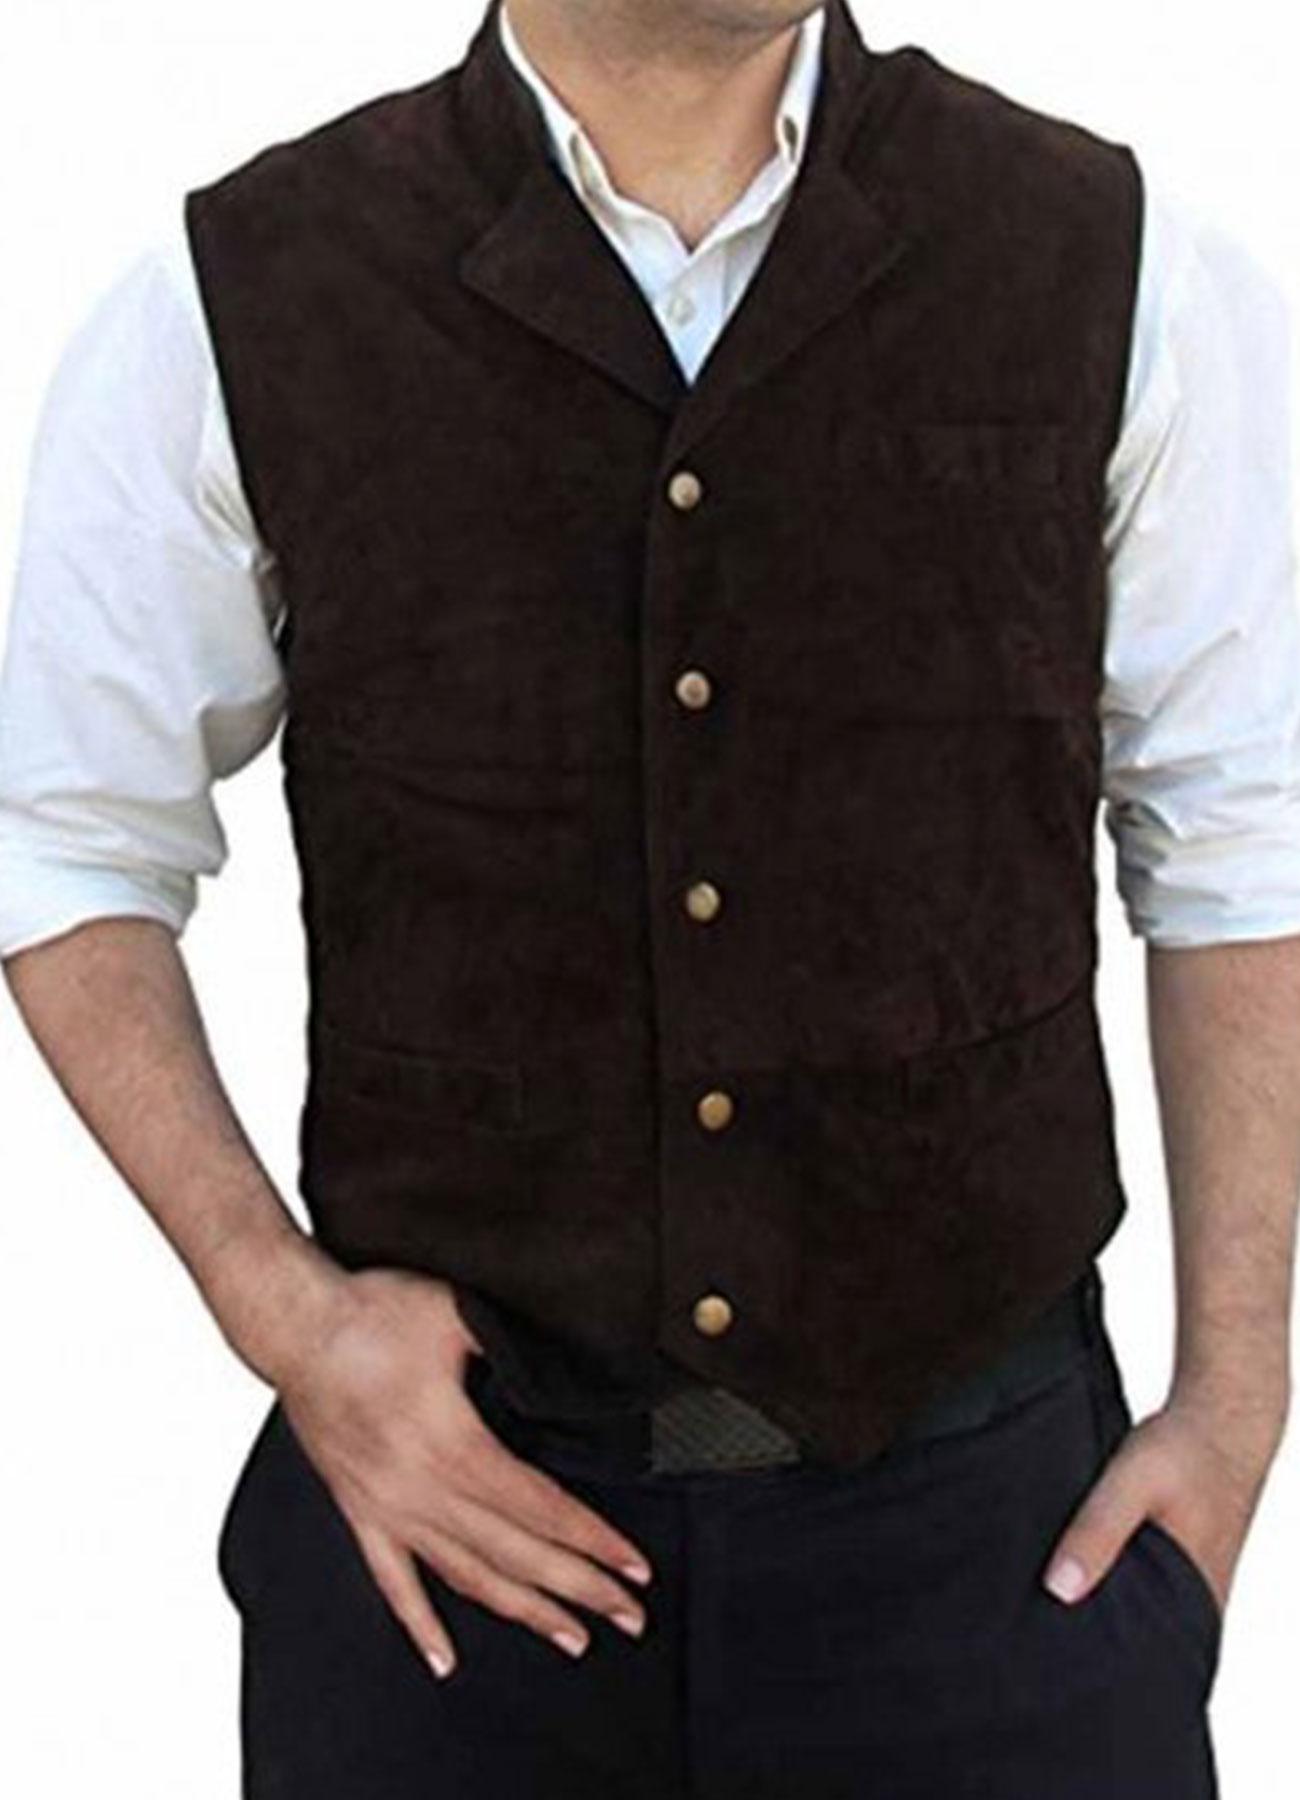 Chris Pratt The Magnificent Seven Brown Suede Leather Vest